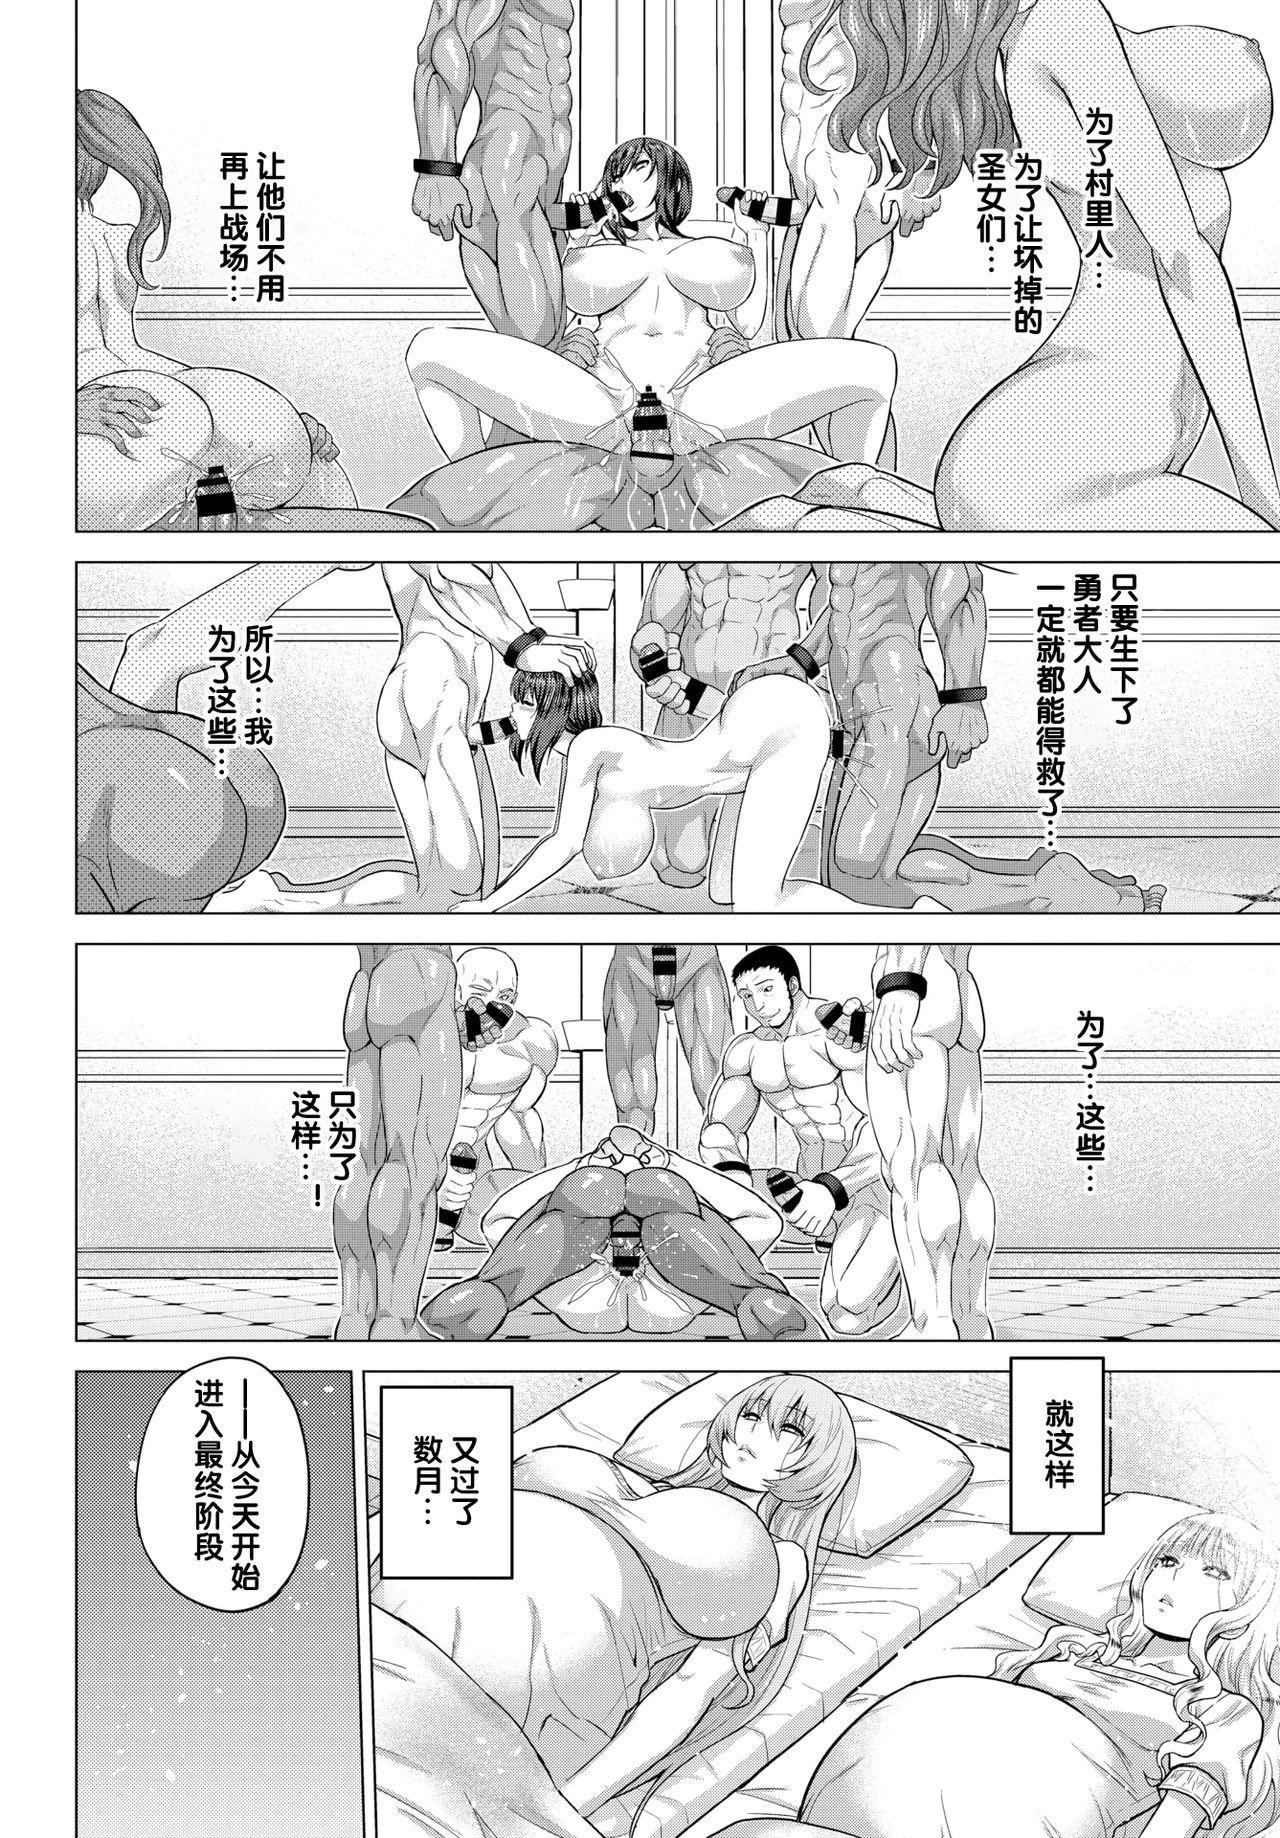 [Yamada Gogogo] Seijo no Rakuin -Annunciation of despair- #05 (COMIC BAVEL 2021-03) [Chinese] [不够色汉化组] [Digital] 8